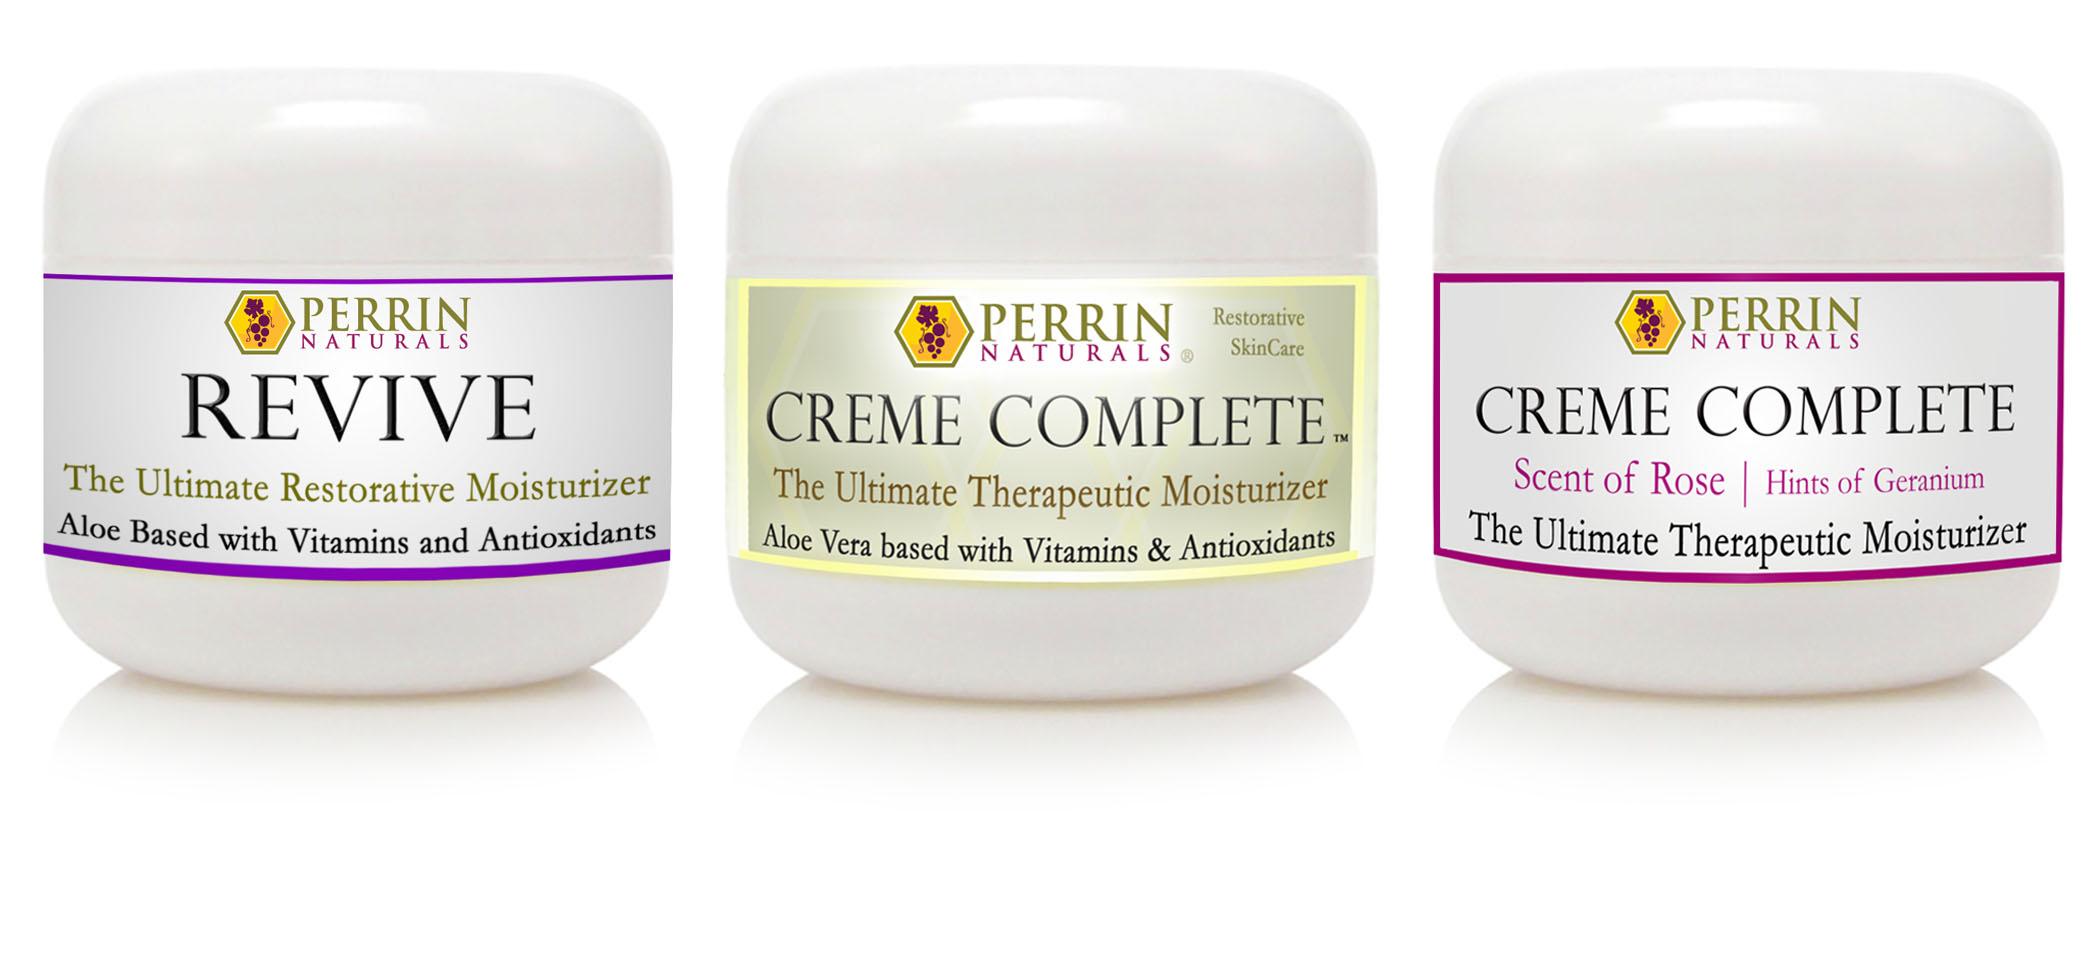 3 pack of perrin naturals creams